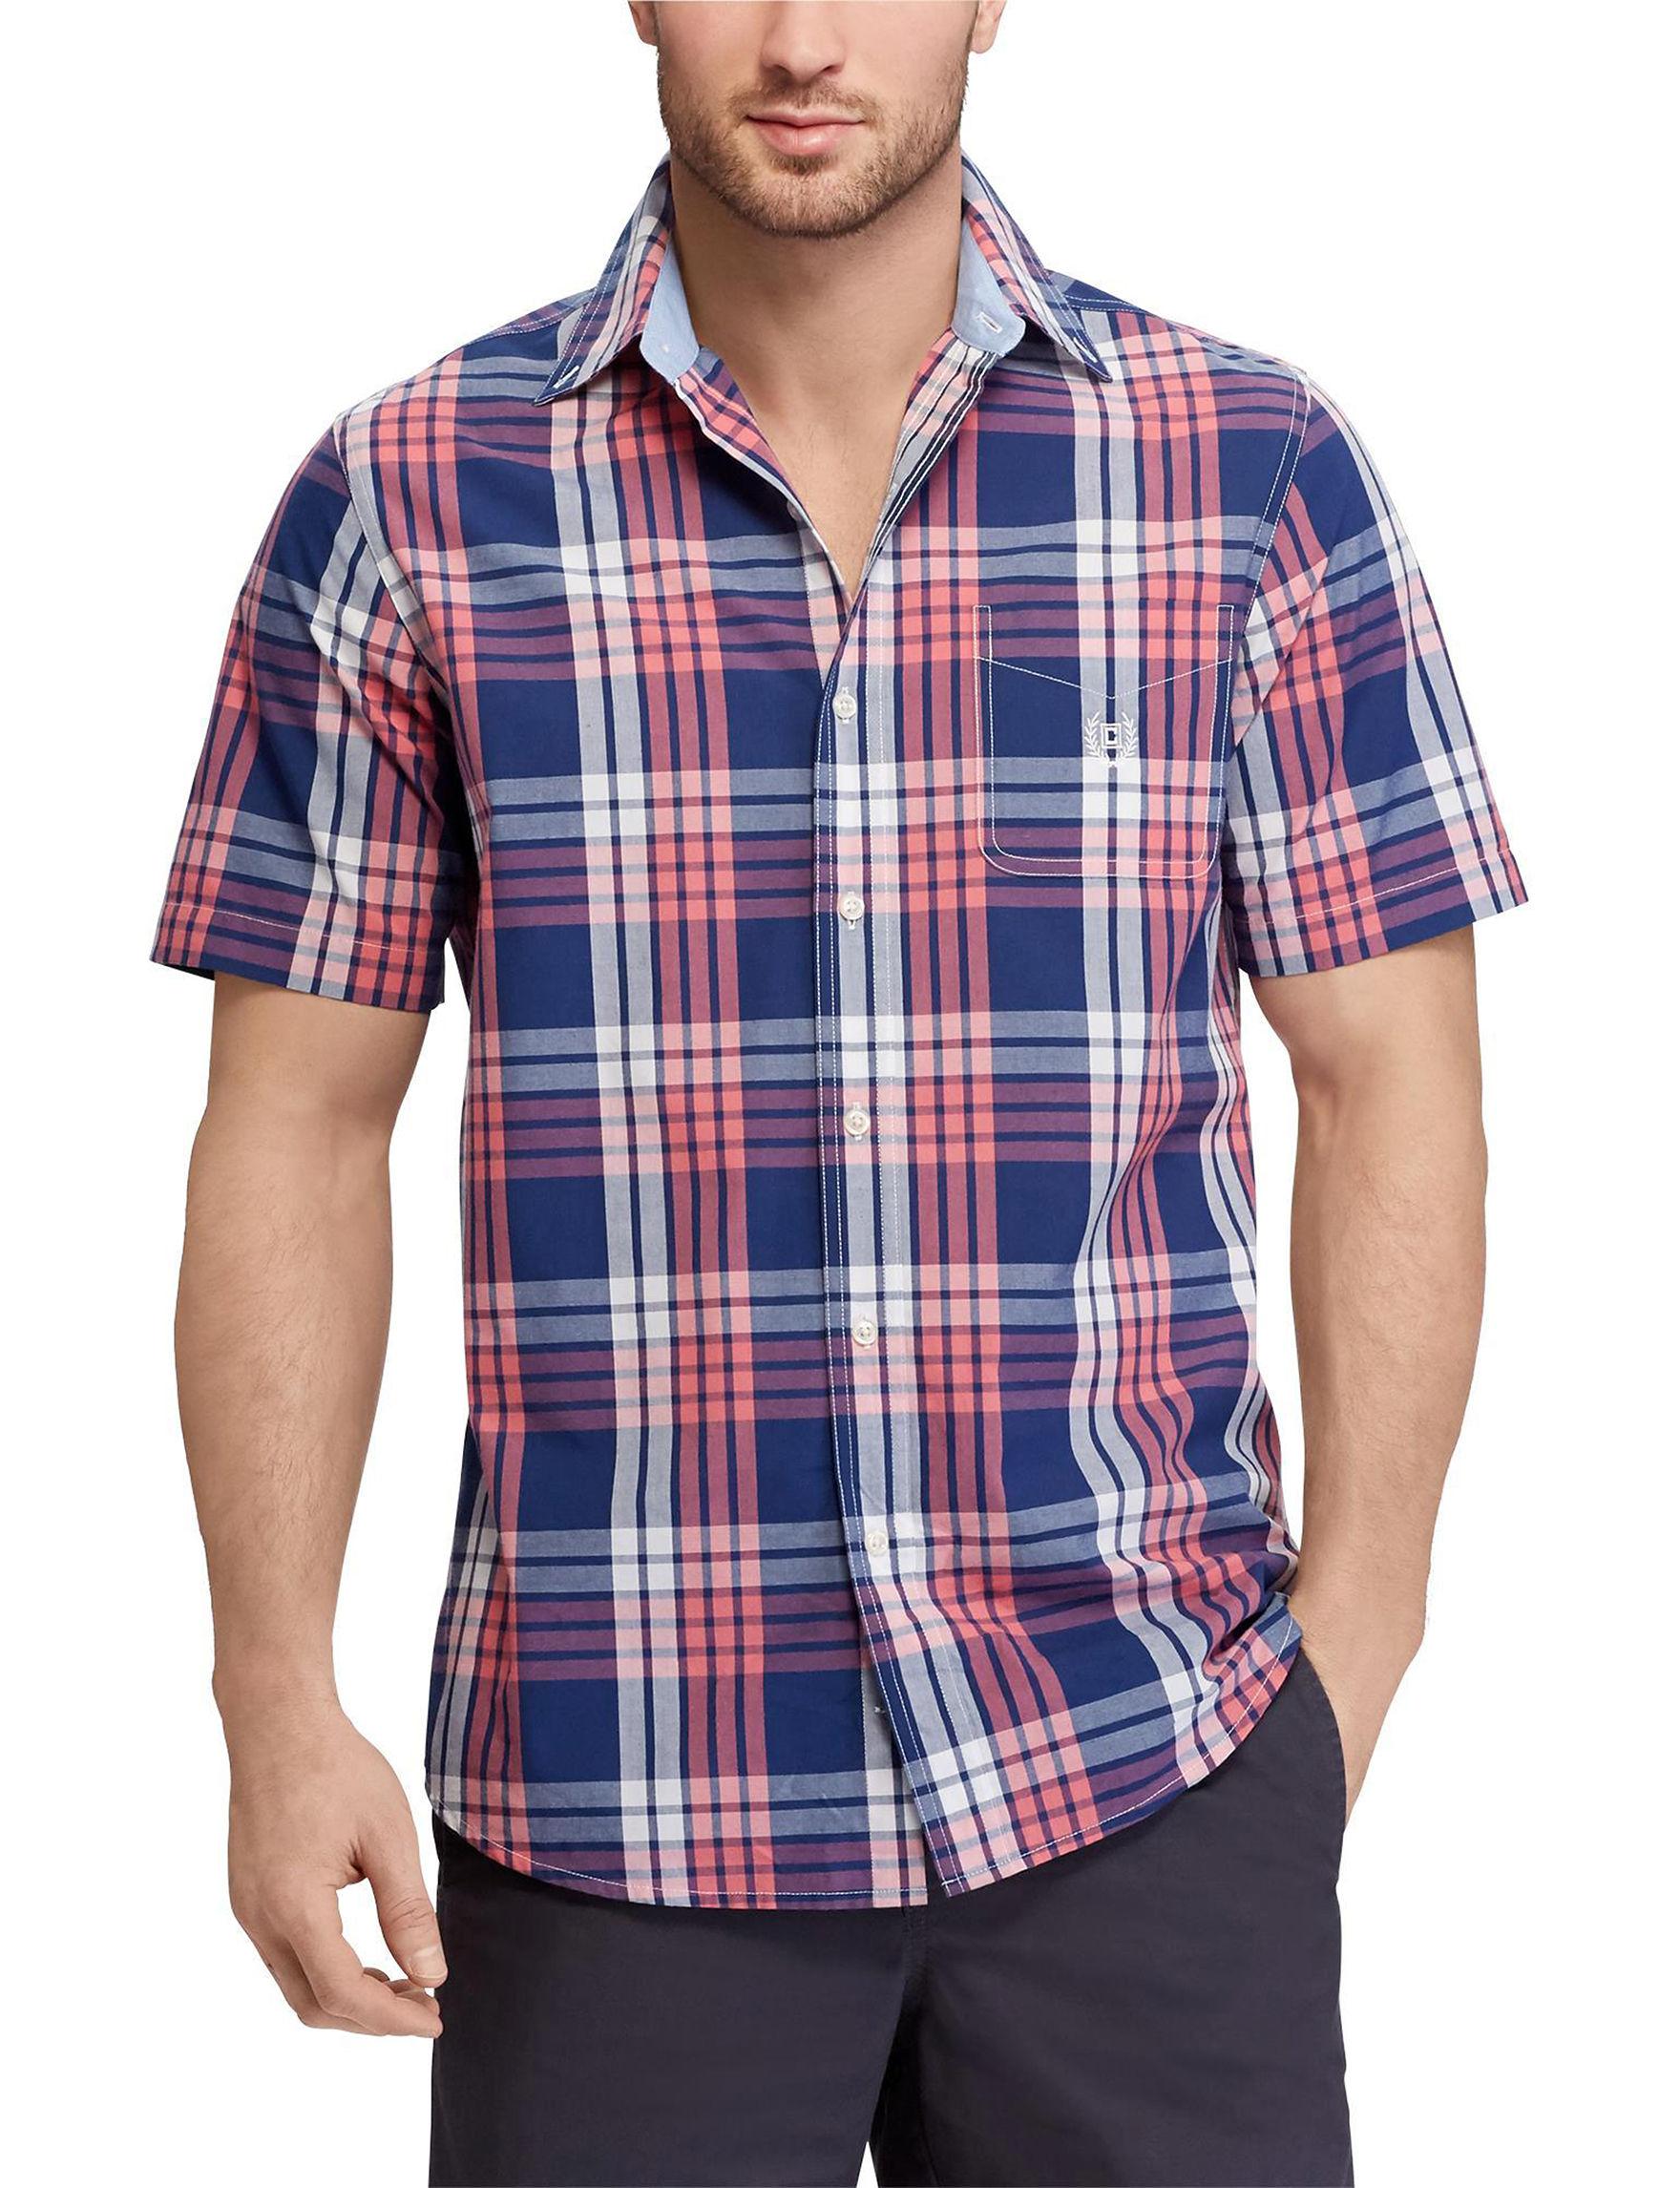 Chaps Navy Plaid Casual Button Down Shirts